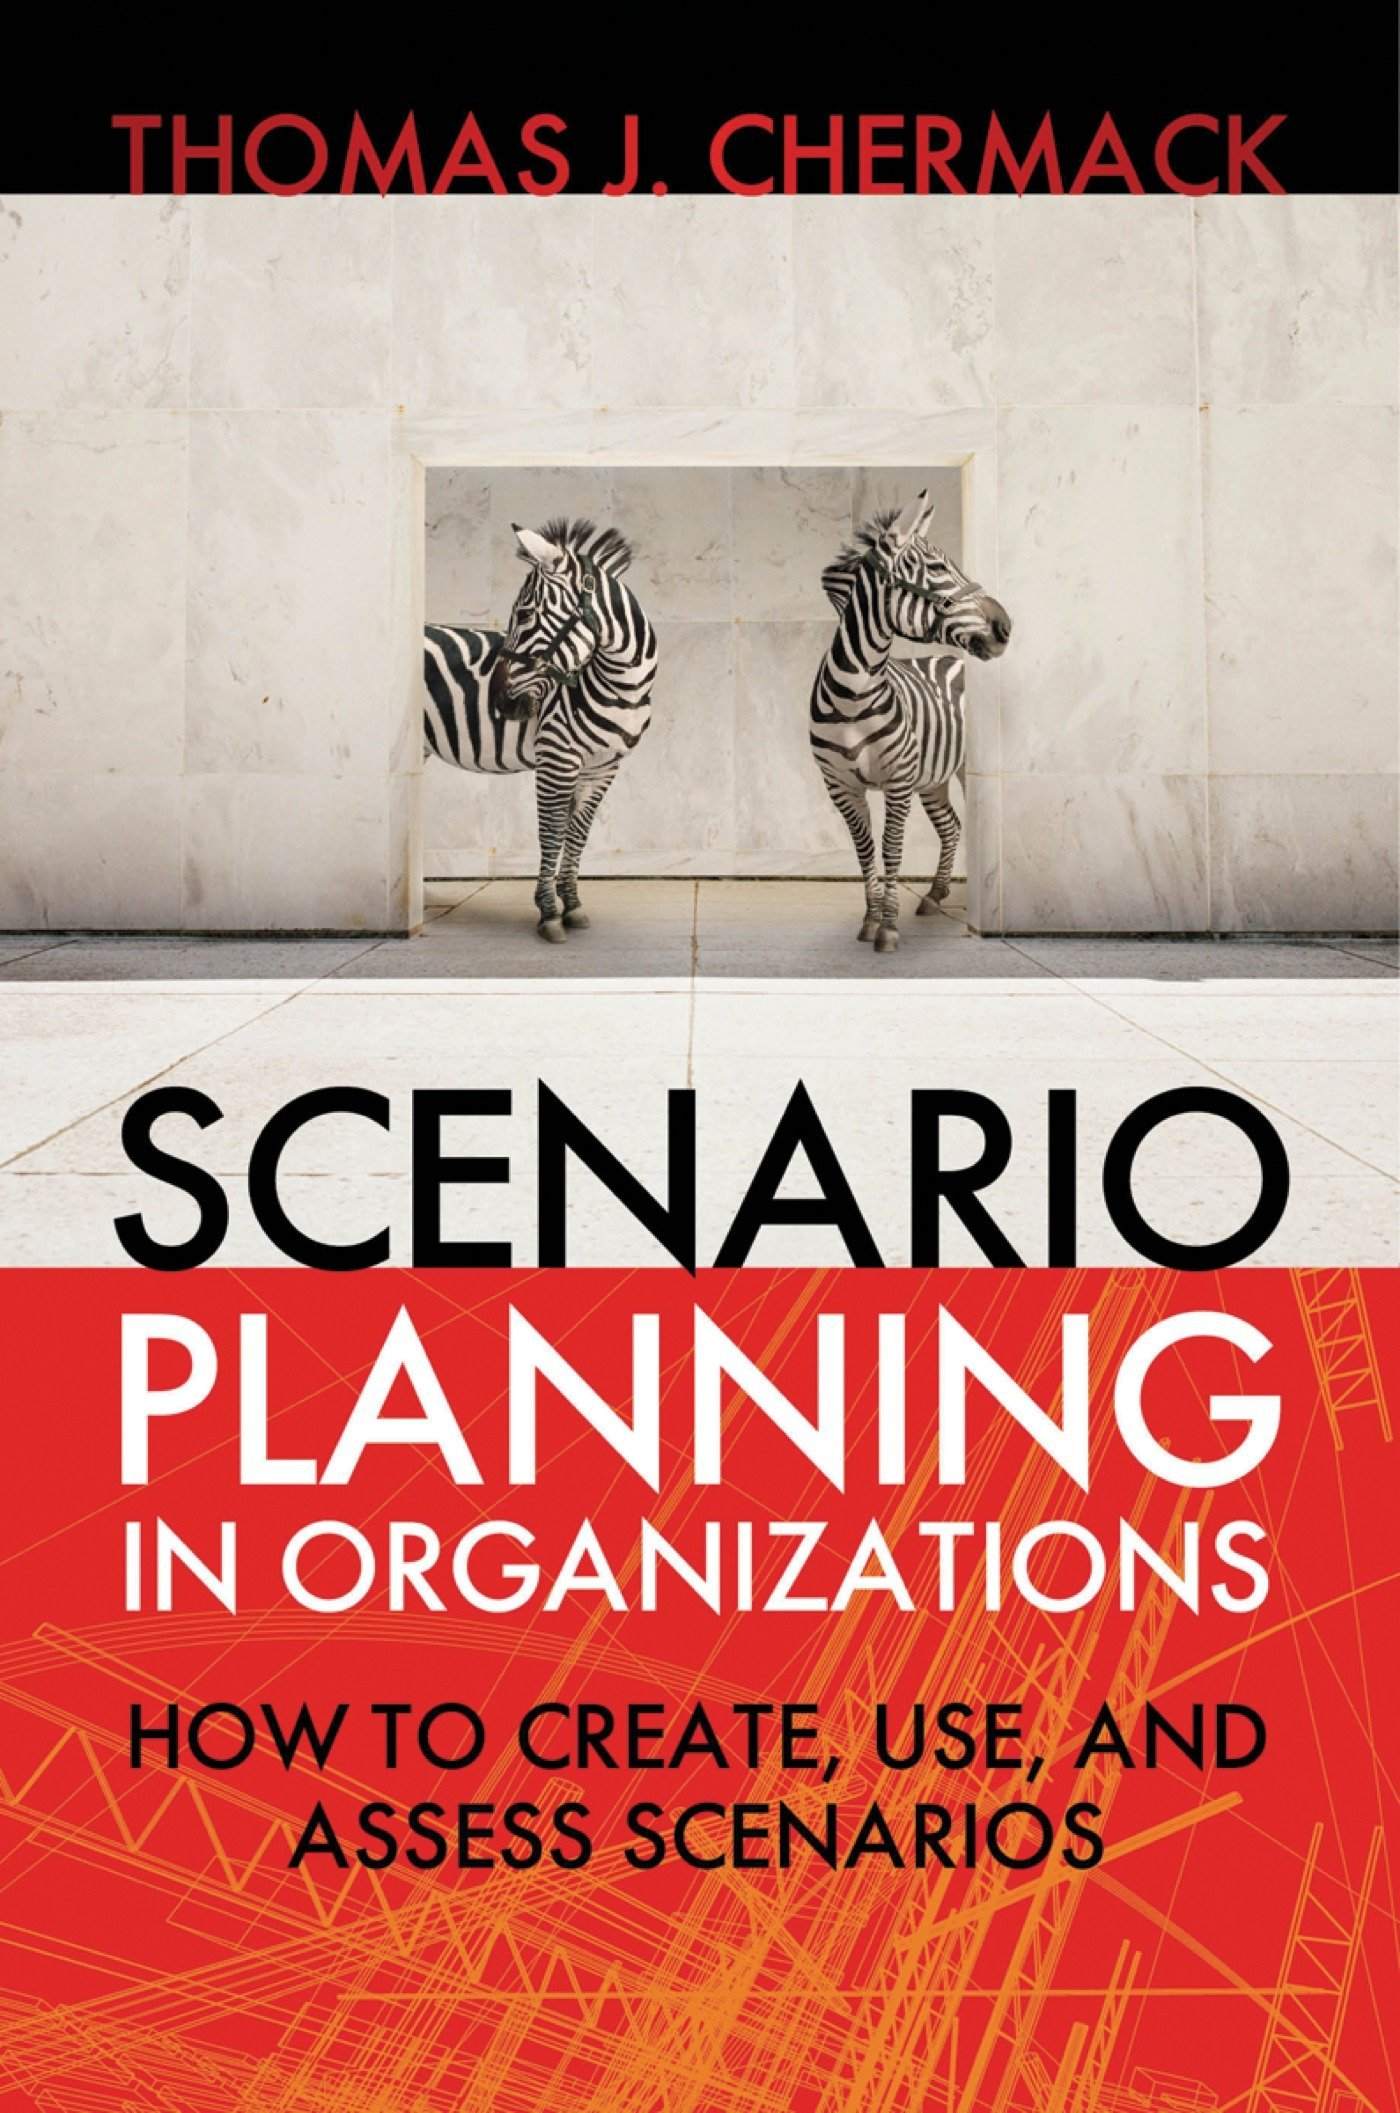 Scenario Planning in Organizations: How to Create, Use, and Assess Scenarios ebook